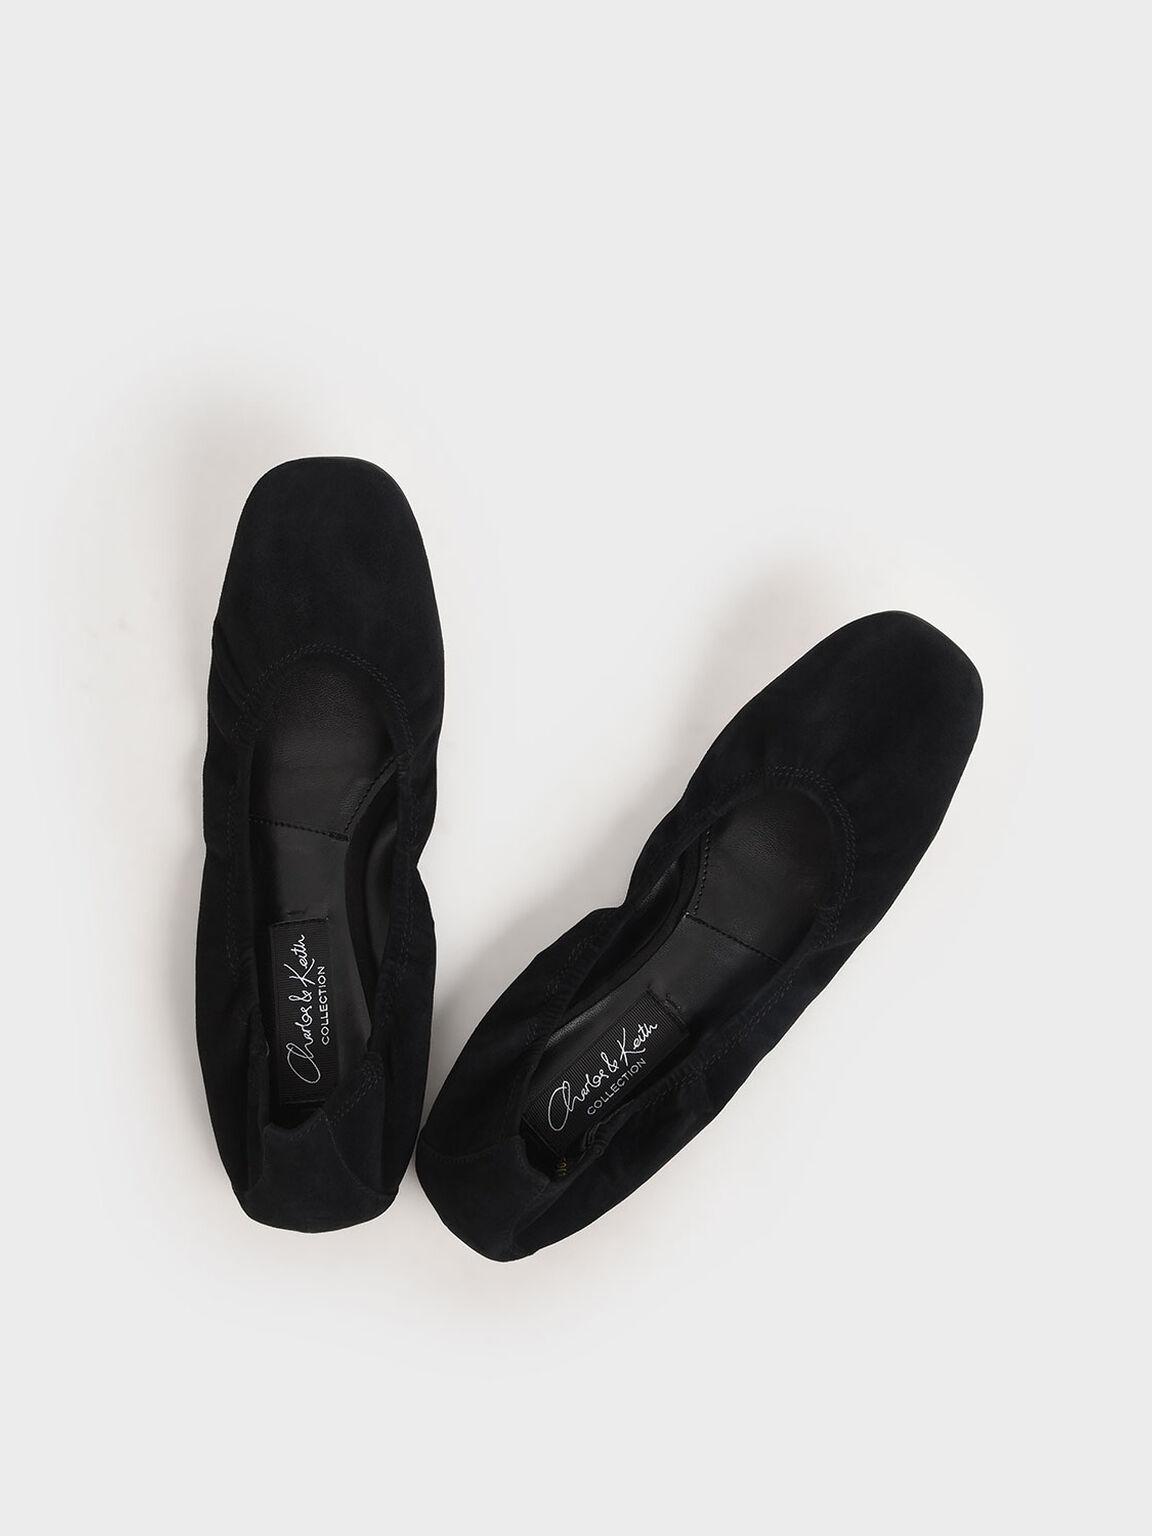 Ruched Ballerina Flats (Kid Suede), Black, hi-res